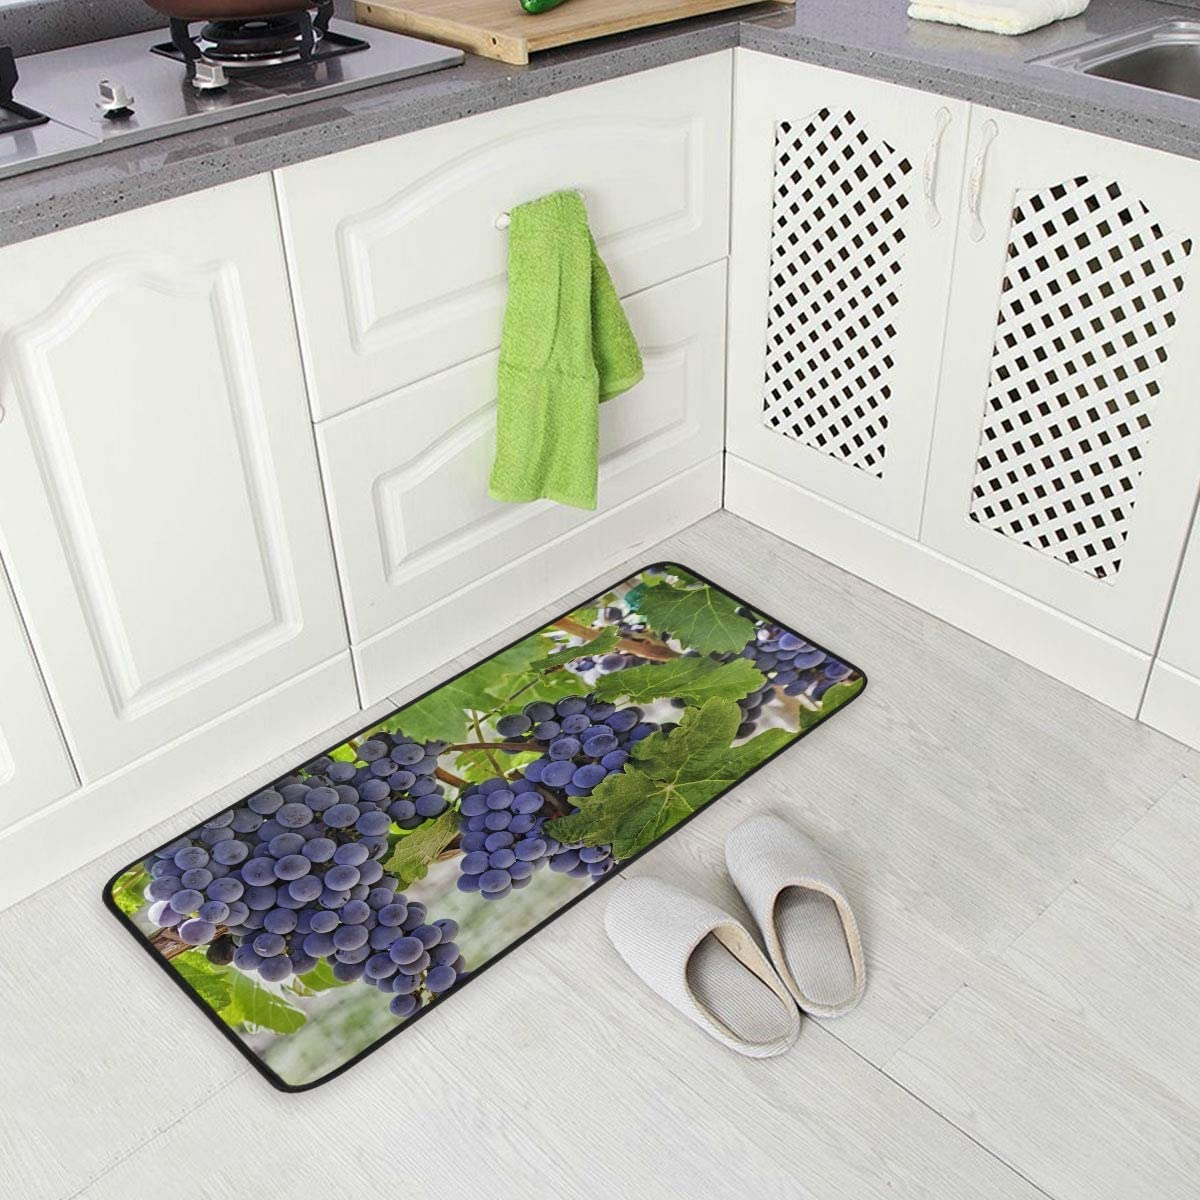 Amazon Com Fruit Grape Grapevine Vines Kitchen Floor Mat Door Mats Inside Outside Front Doormat Non Slip Rug For Home 39 X 20 Dining